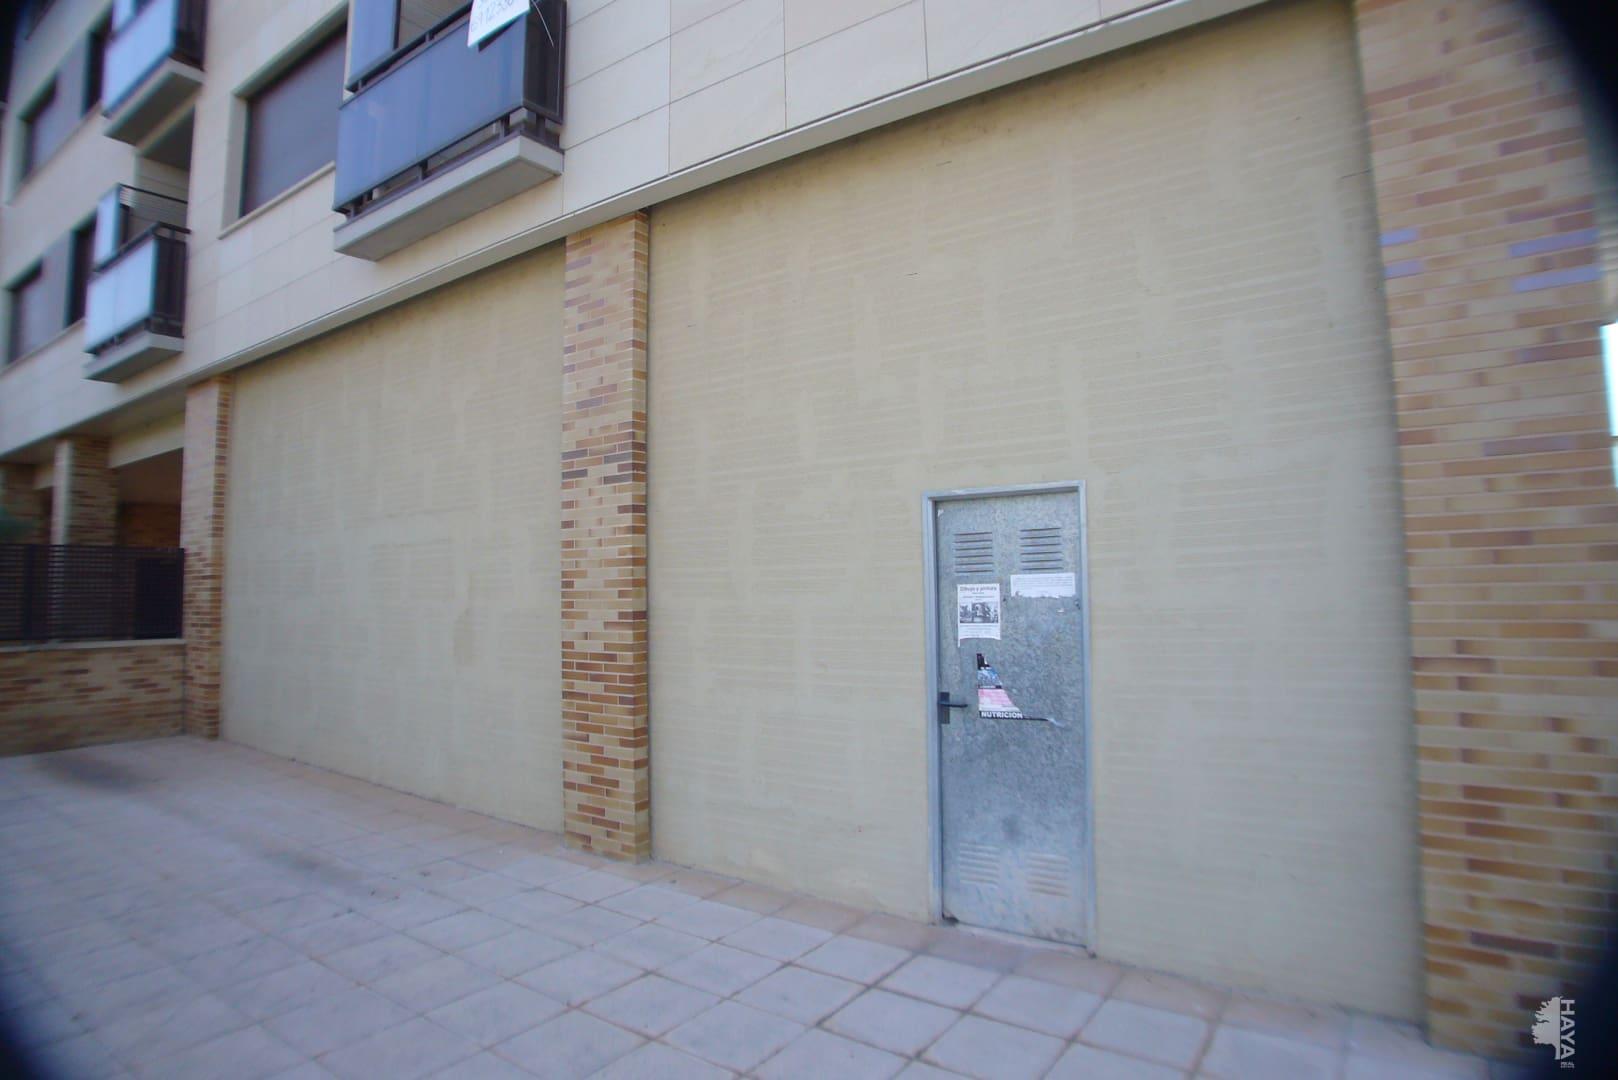 Local en venta en Logroño, La Rioja, Avenida Moncalvillo, 146.000 €, 147 m2